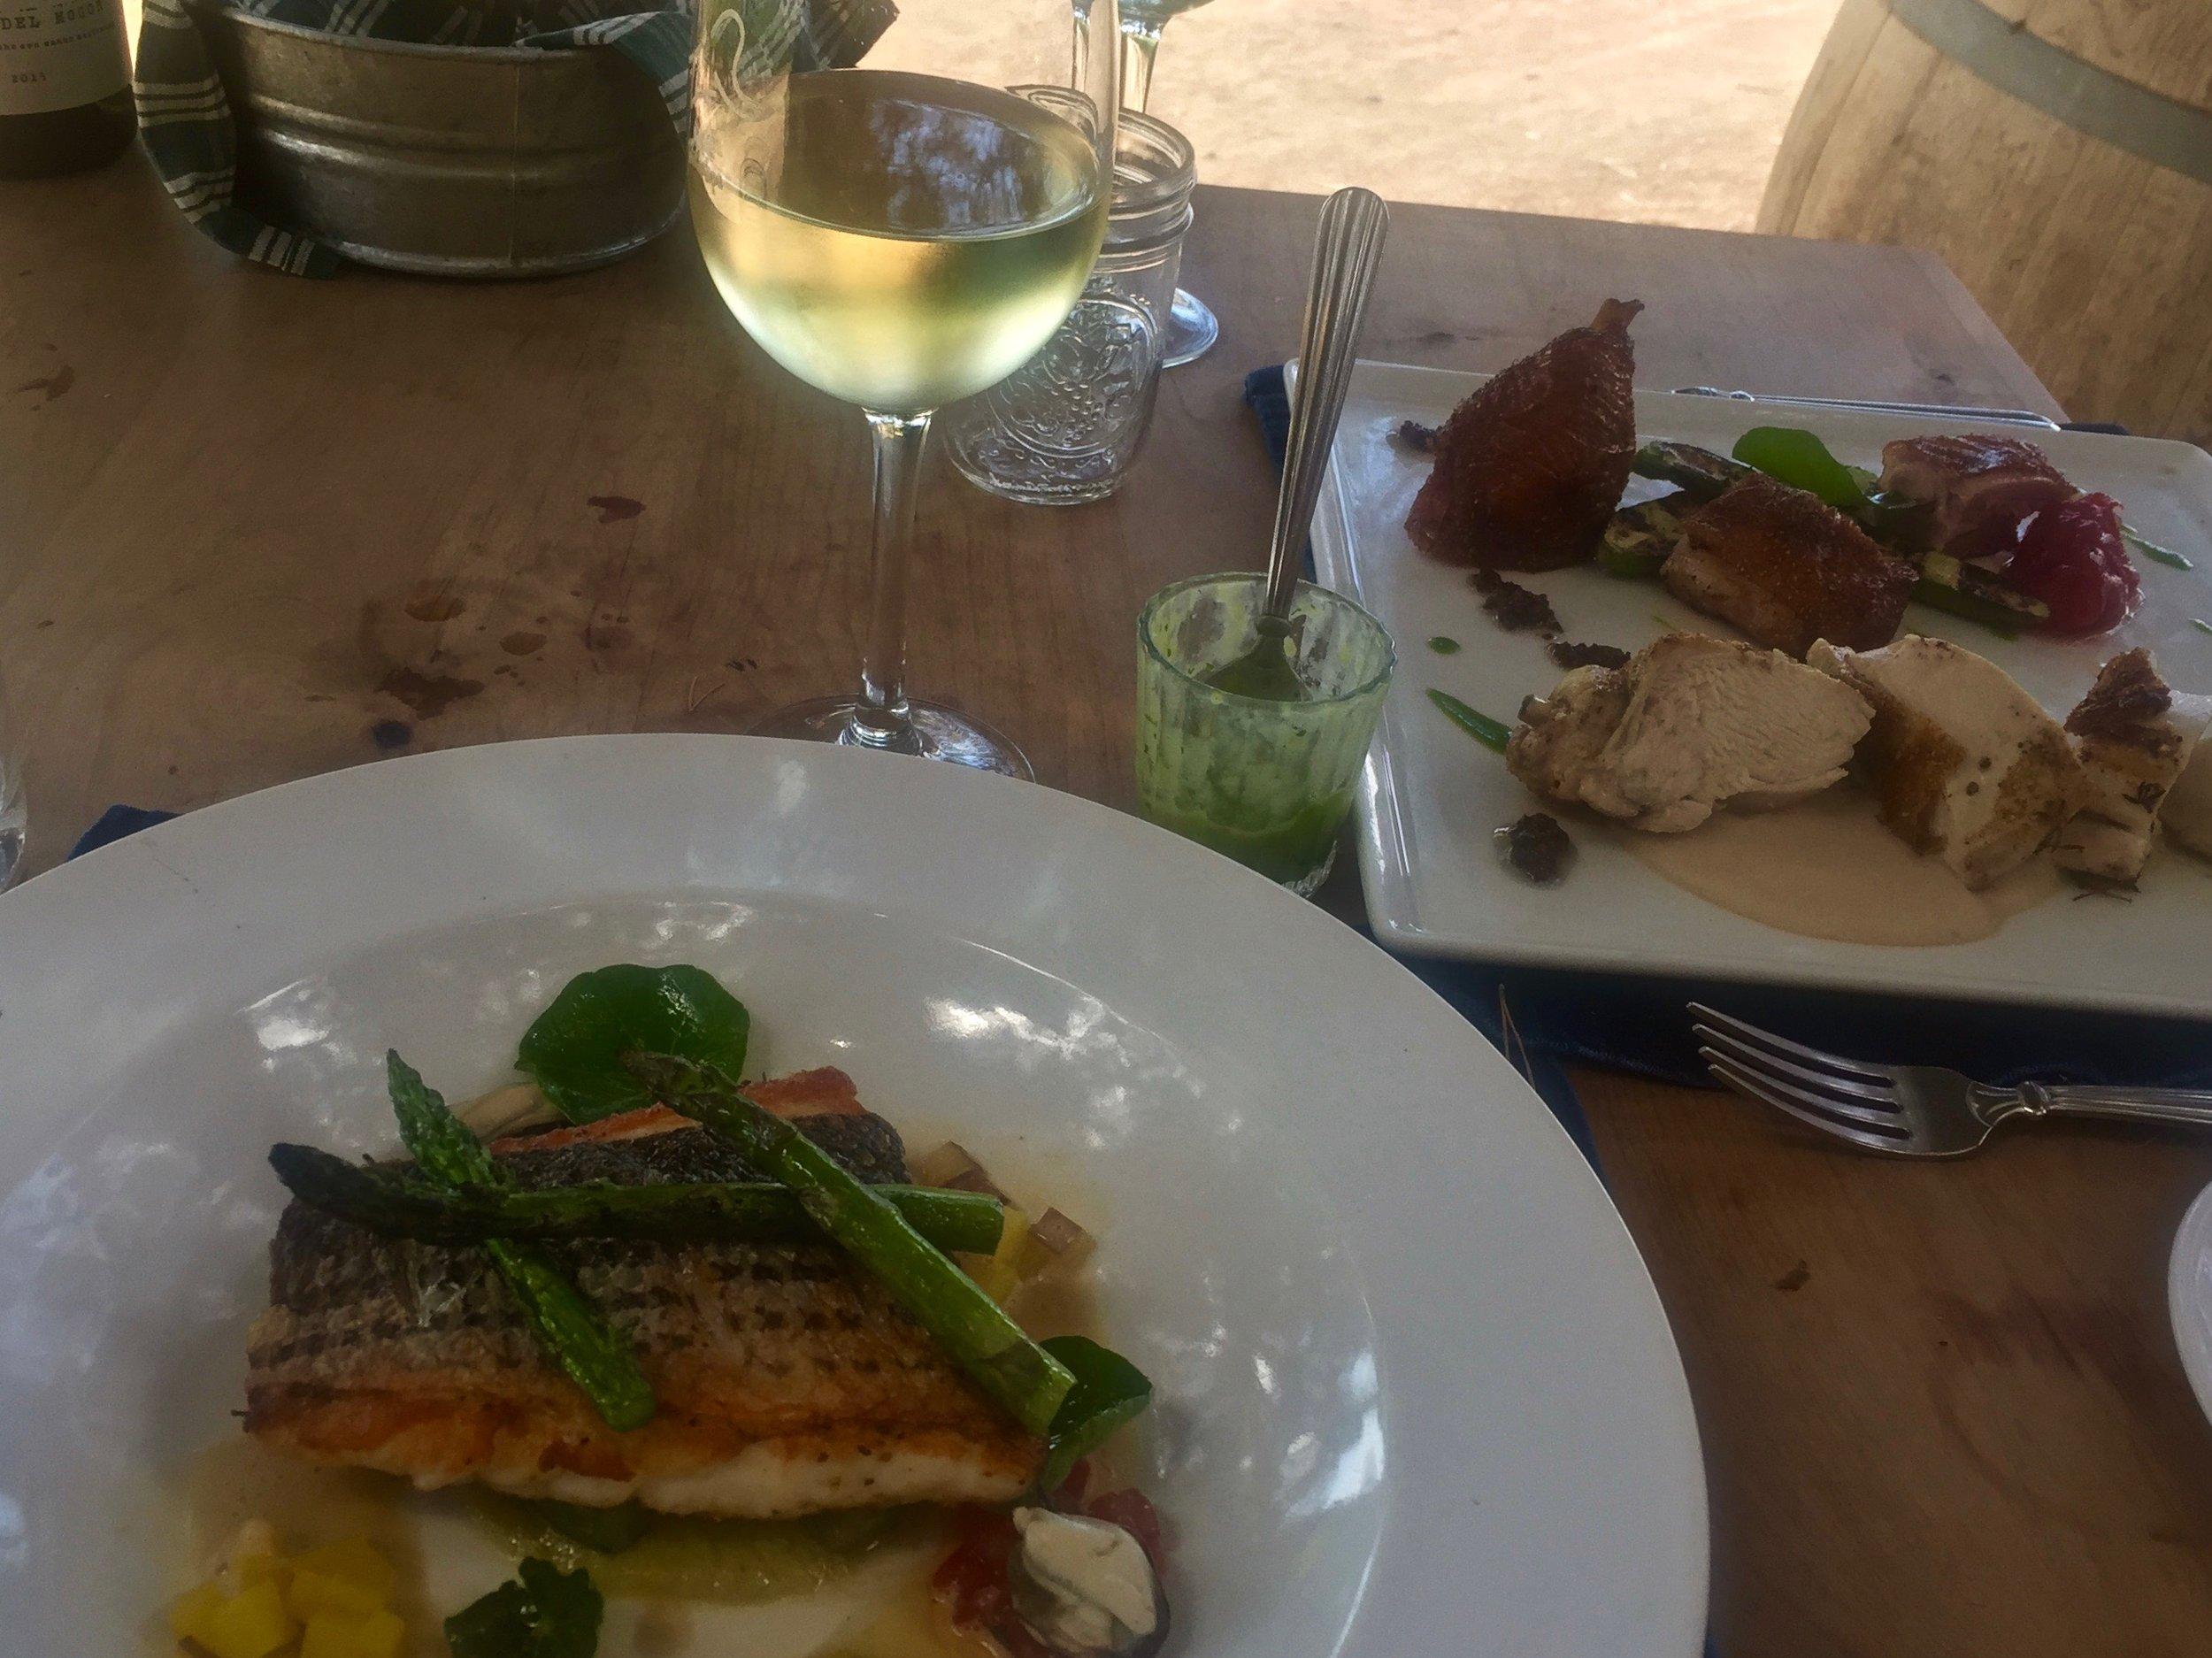 Almuerzo (lunch) at Deckman's.